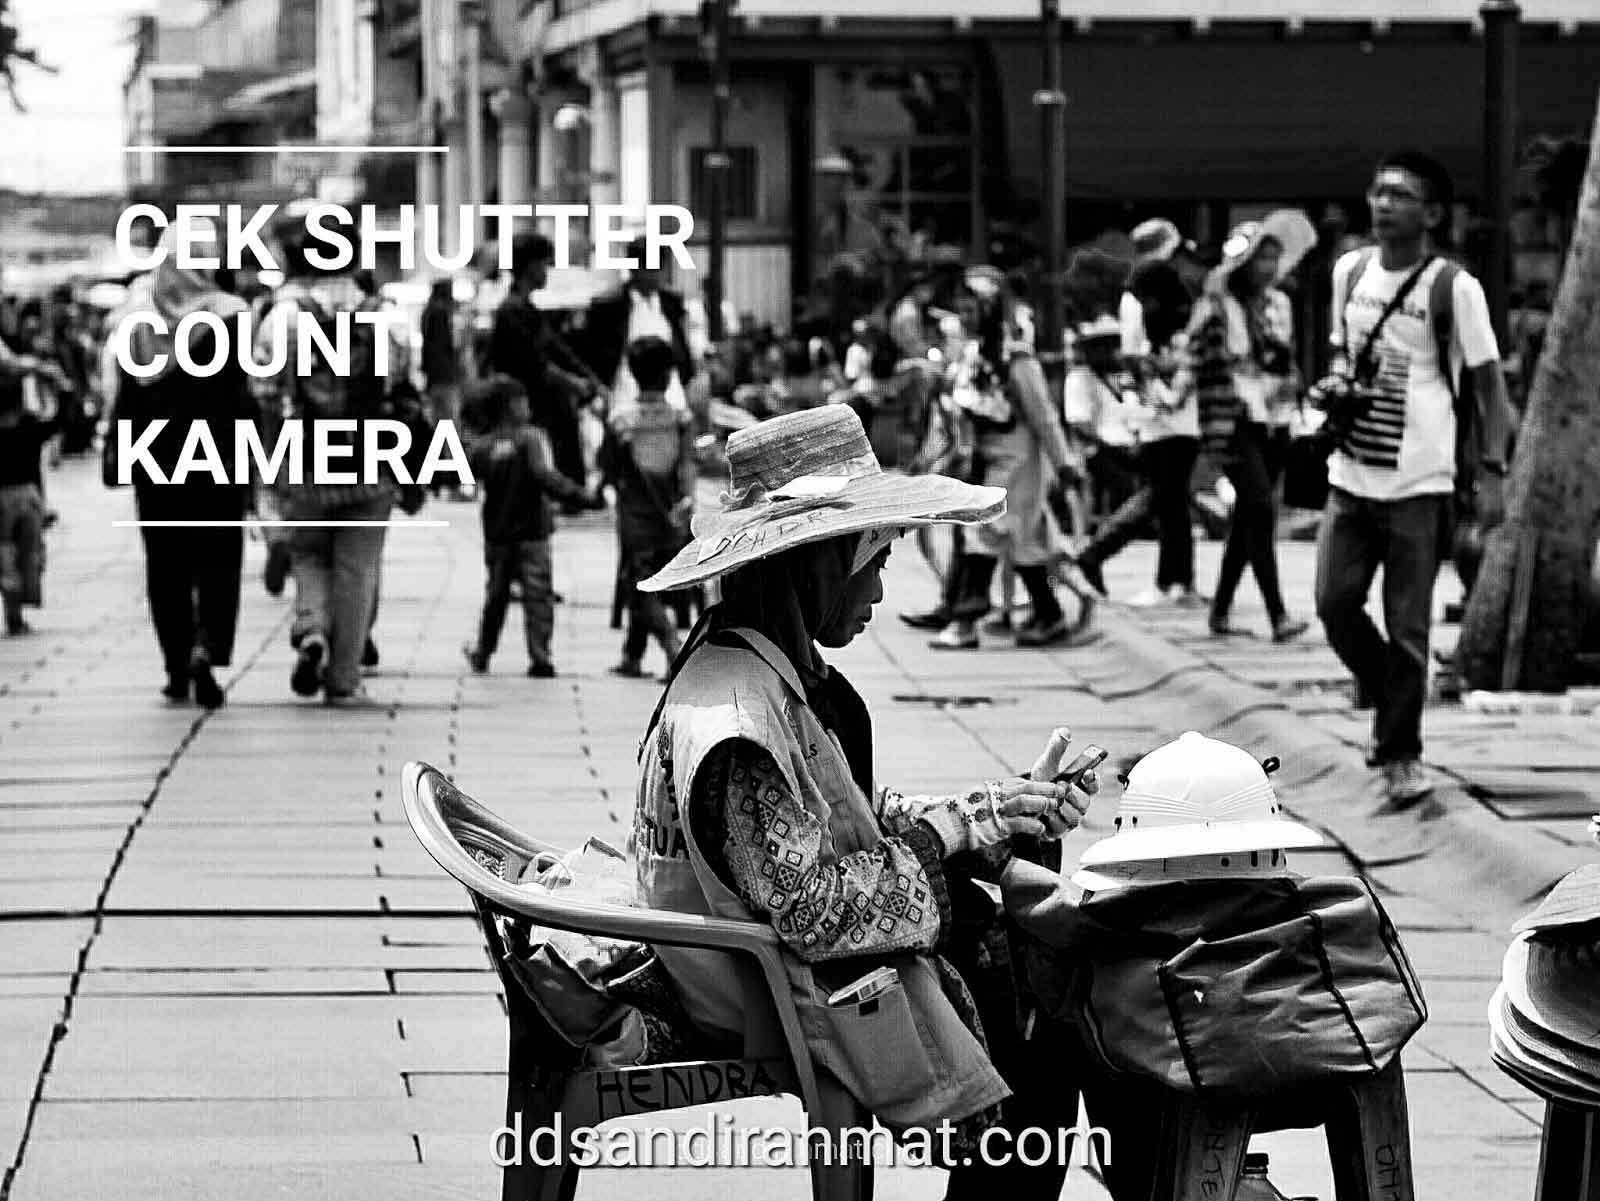 Cara Cek Shutter Count Kamera